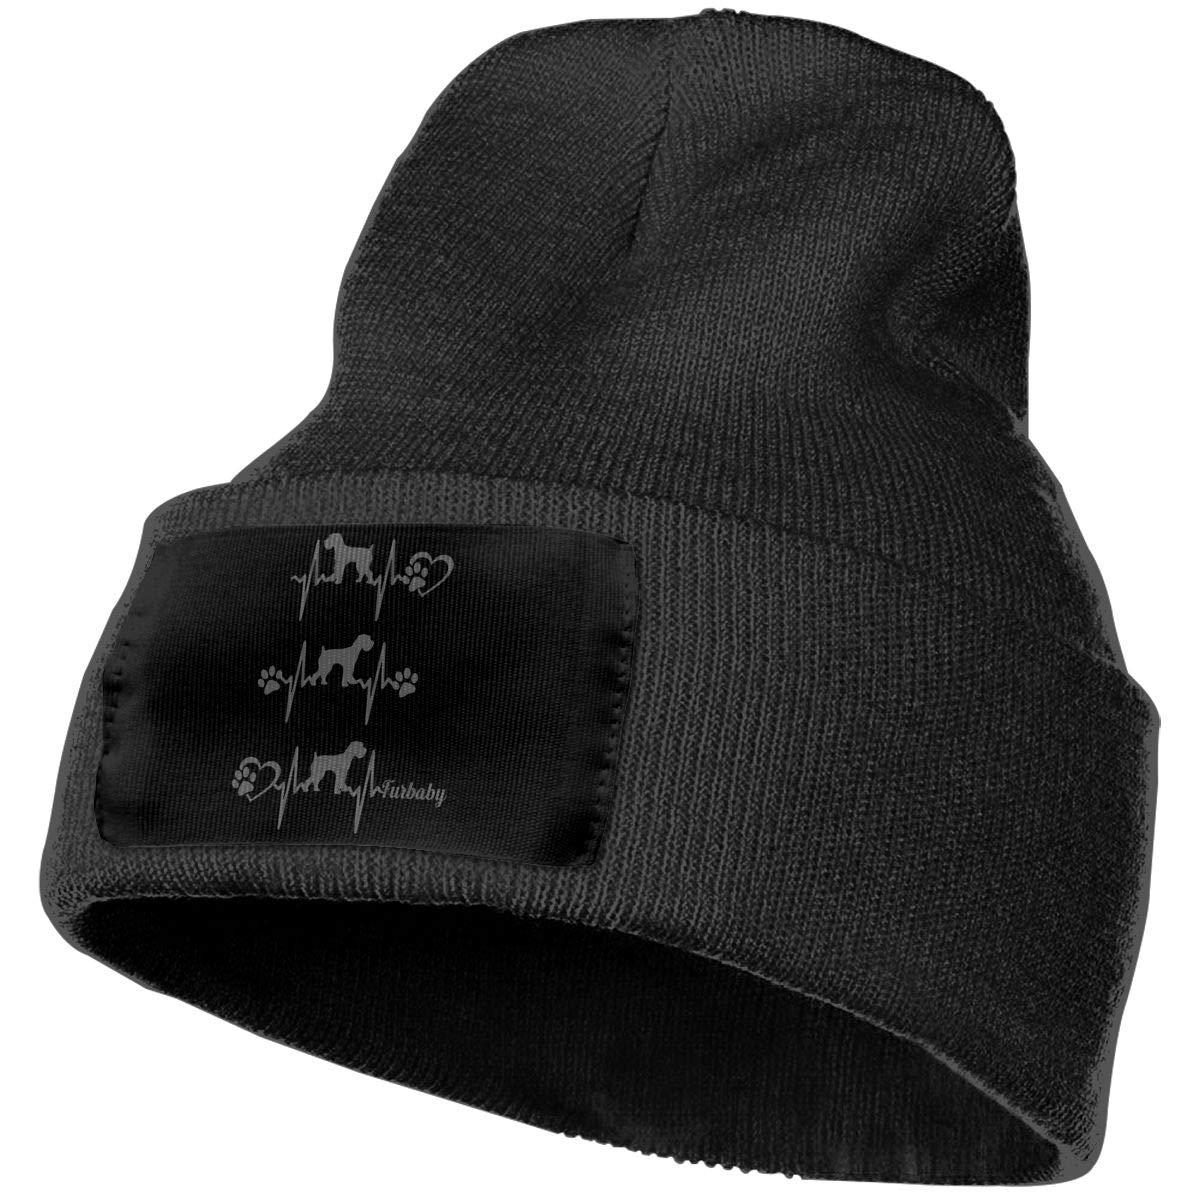 Unisex 3D Knitted Hat Skull Hat Beanie Cap Giant Schnauzer Print Heartbeat